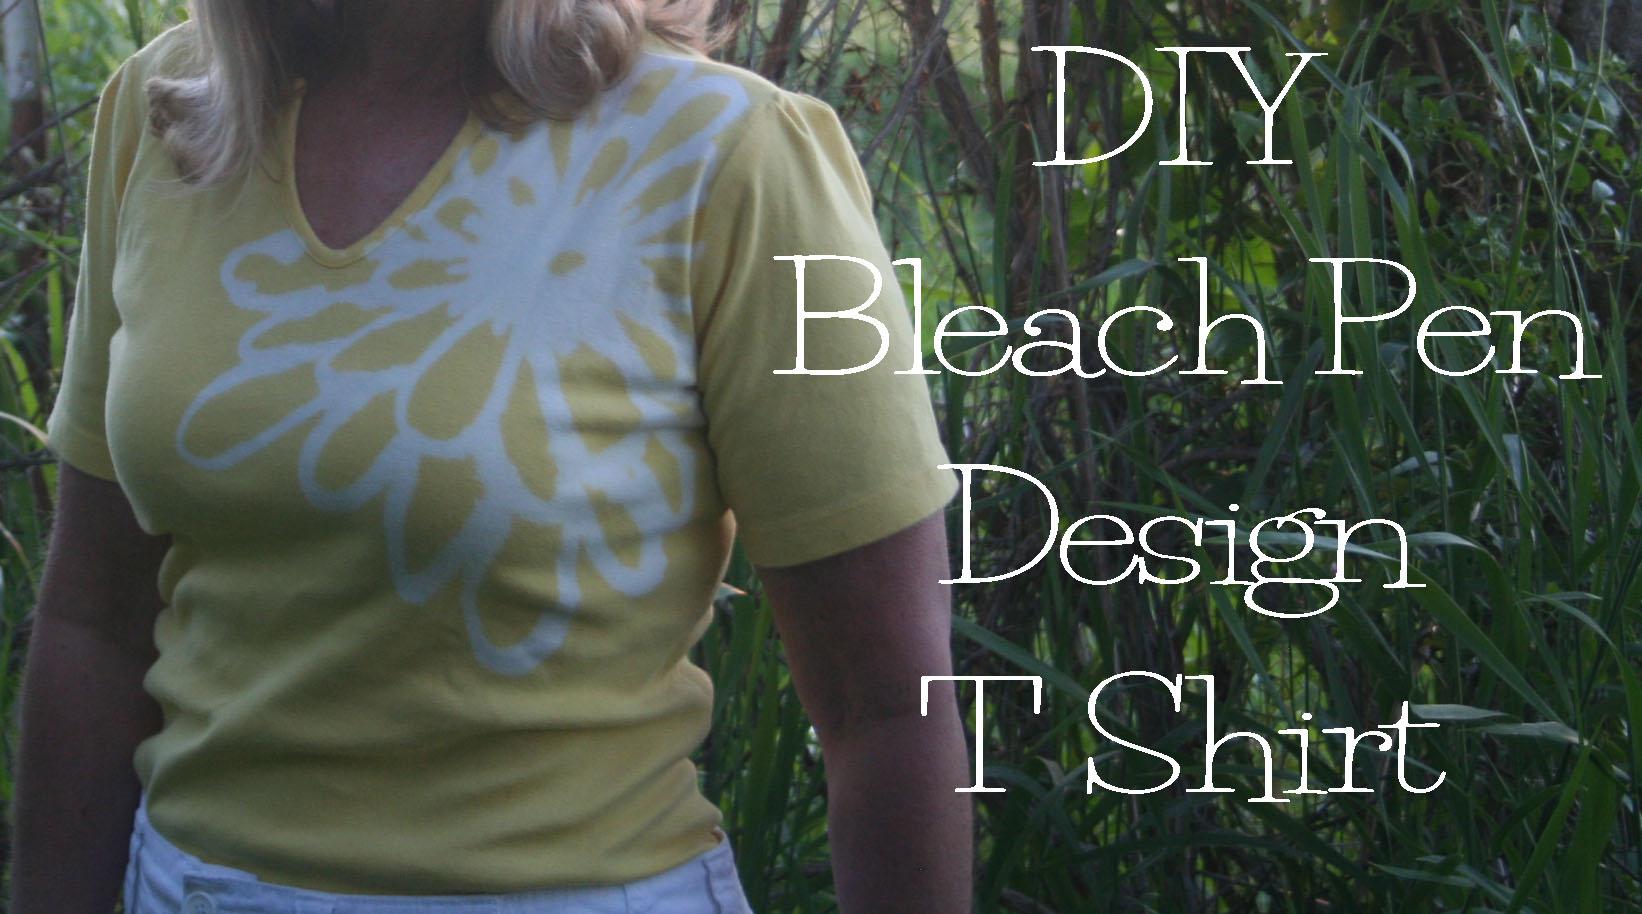 Diy bleach pen t shirt design the renegade seamstress for How to bleach part of a shirt